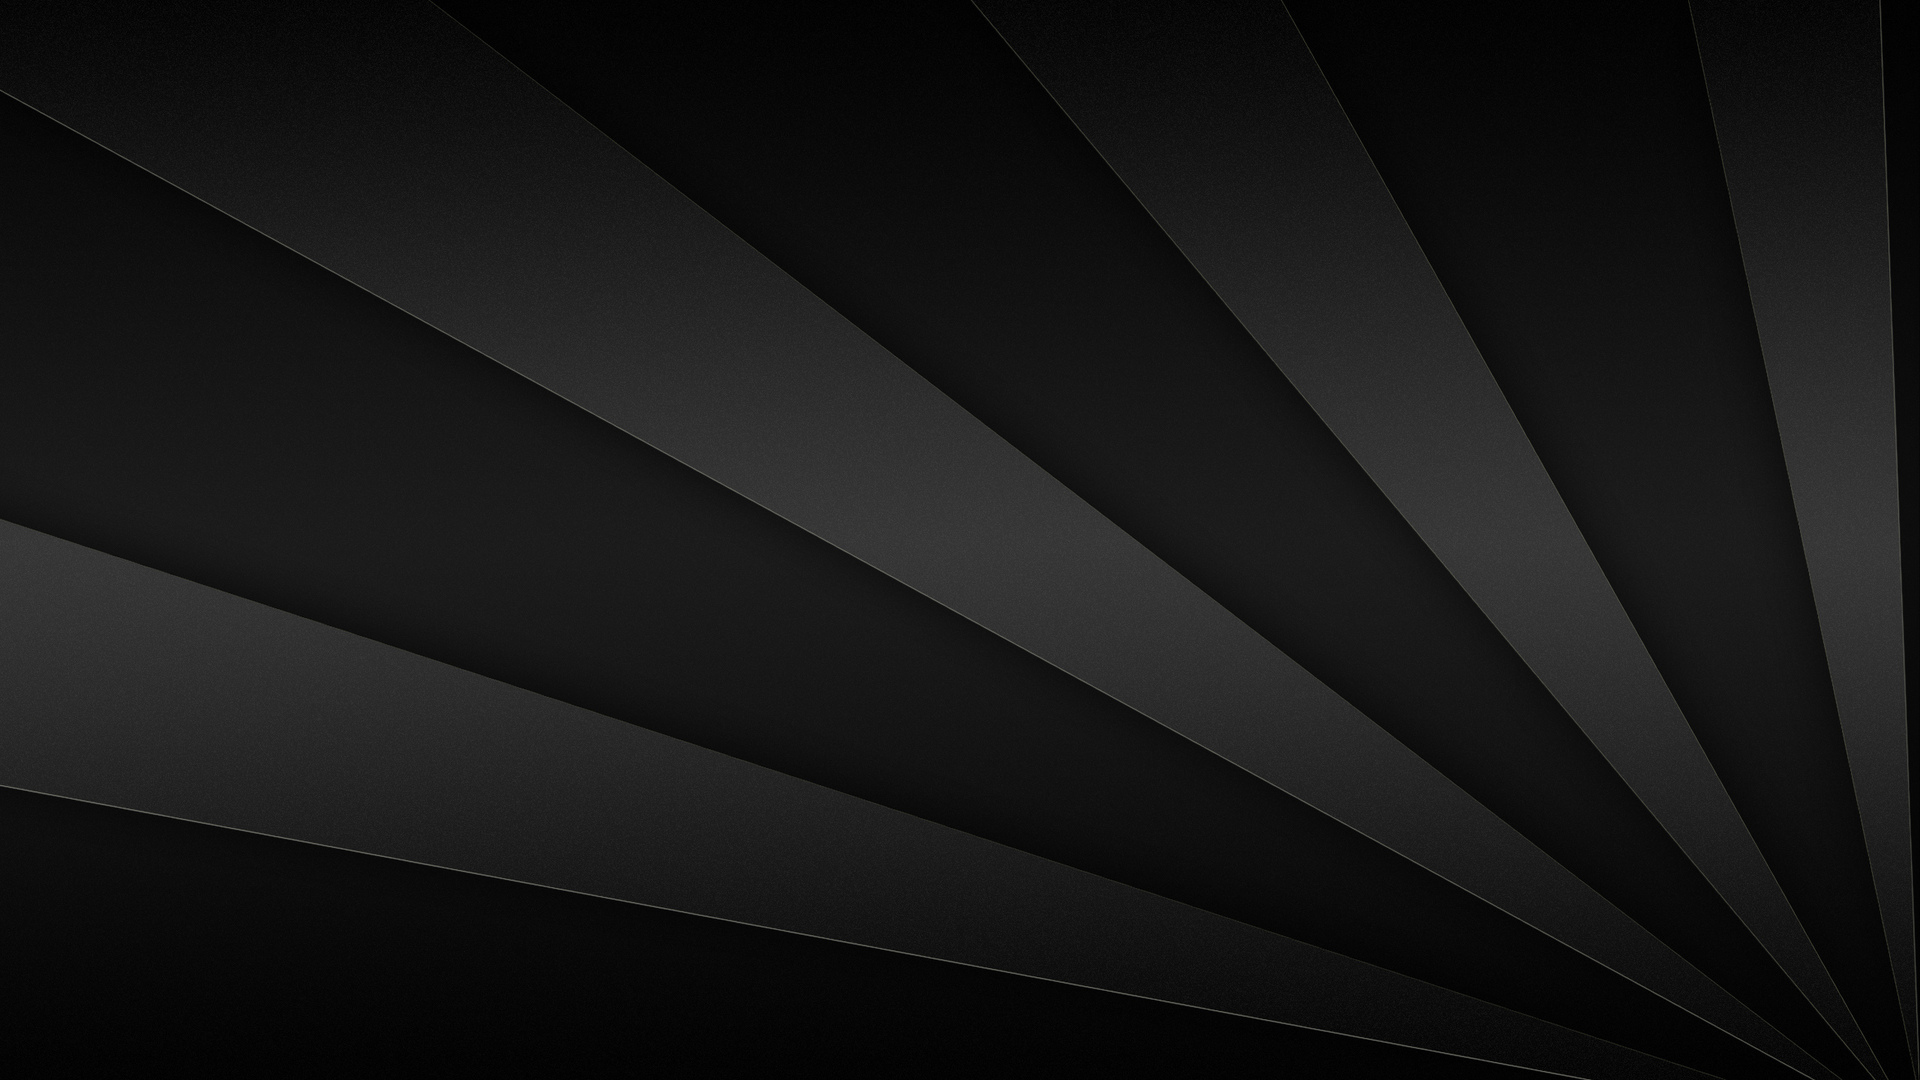 Black Abstract wallpaper pc